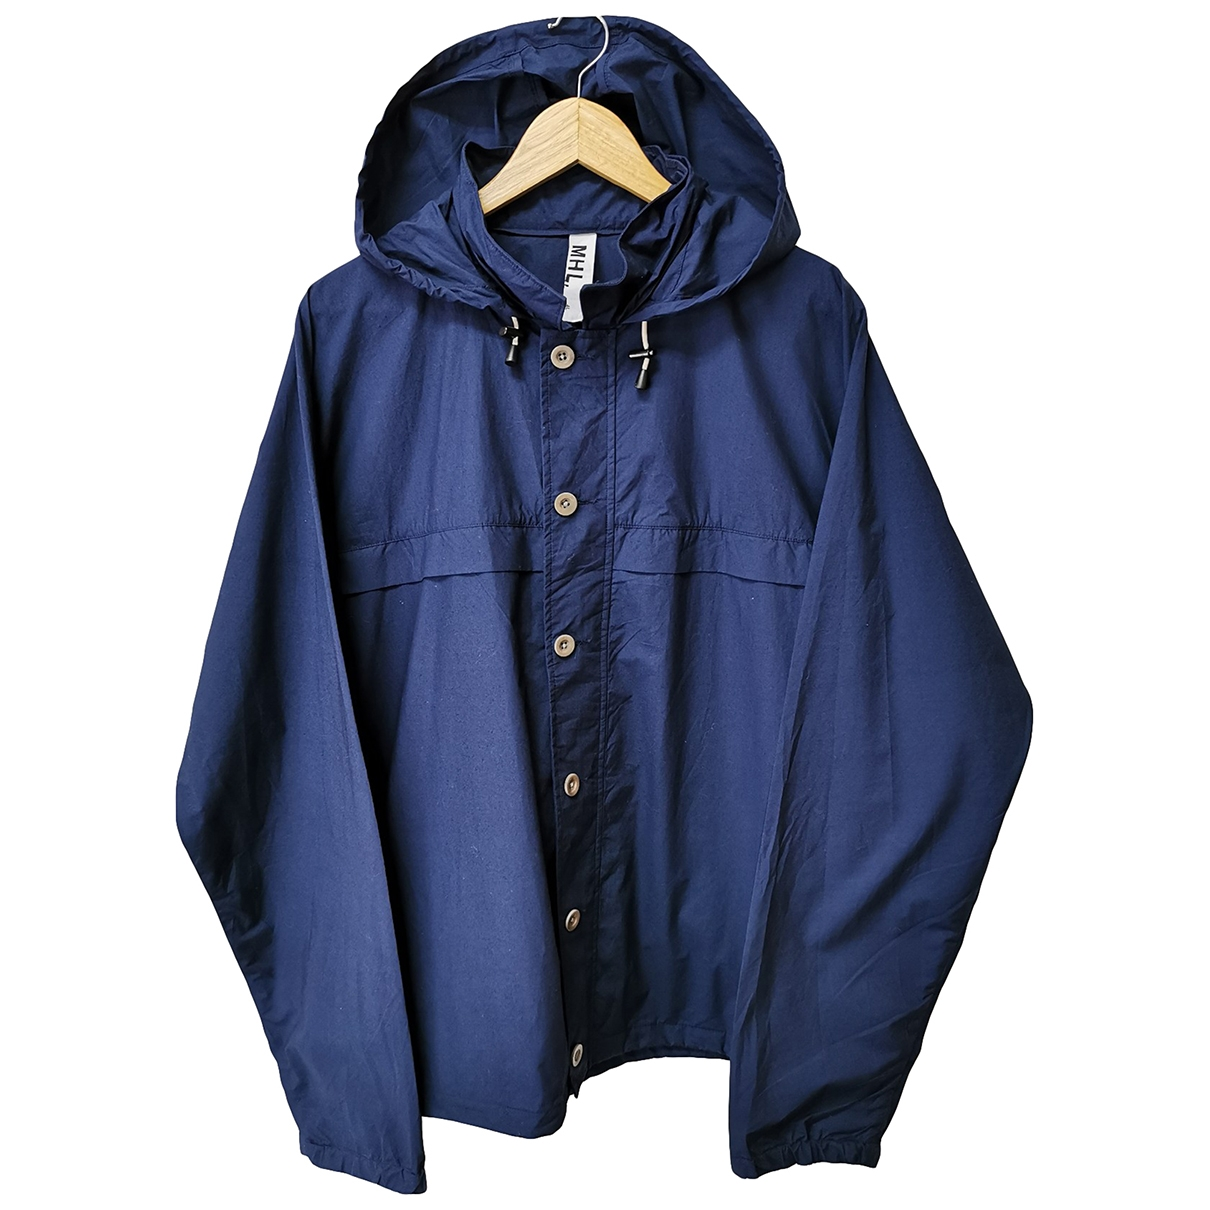 Margaret Howell \N Blue Cotton jacket for Women XL International